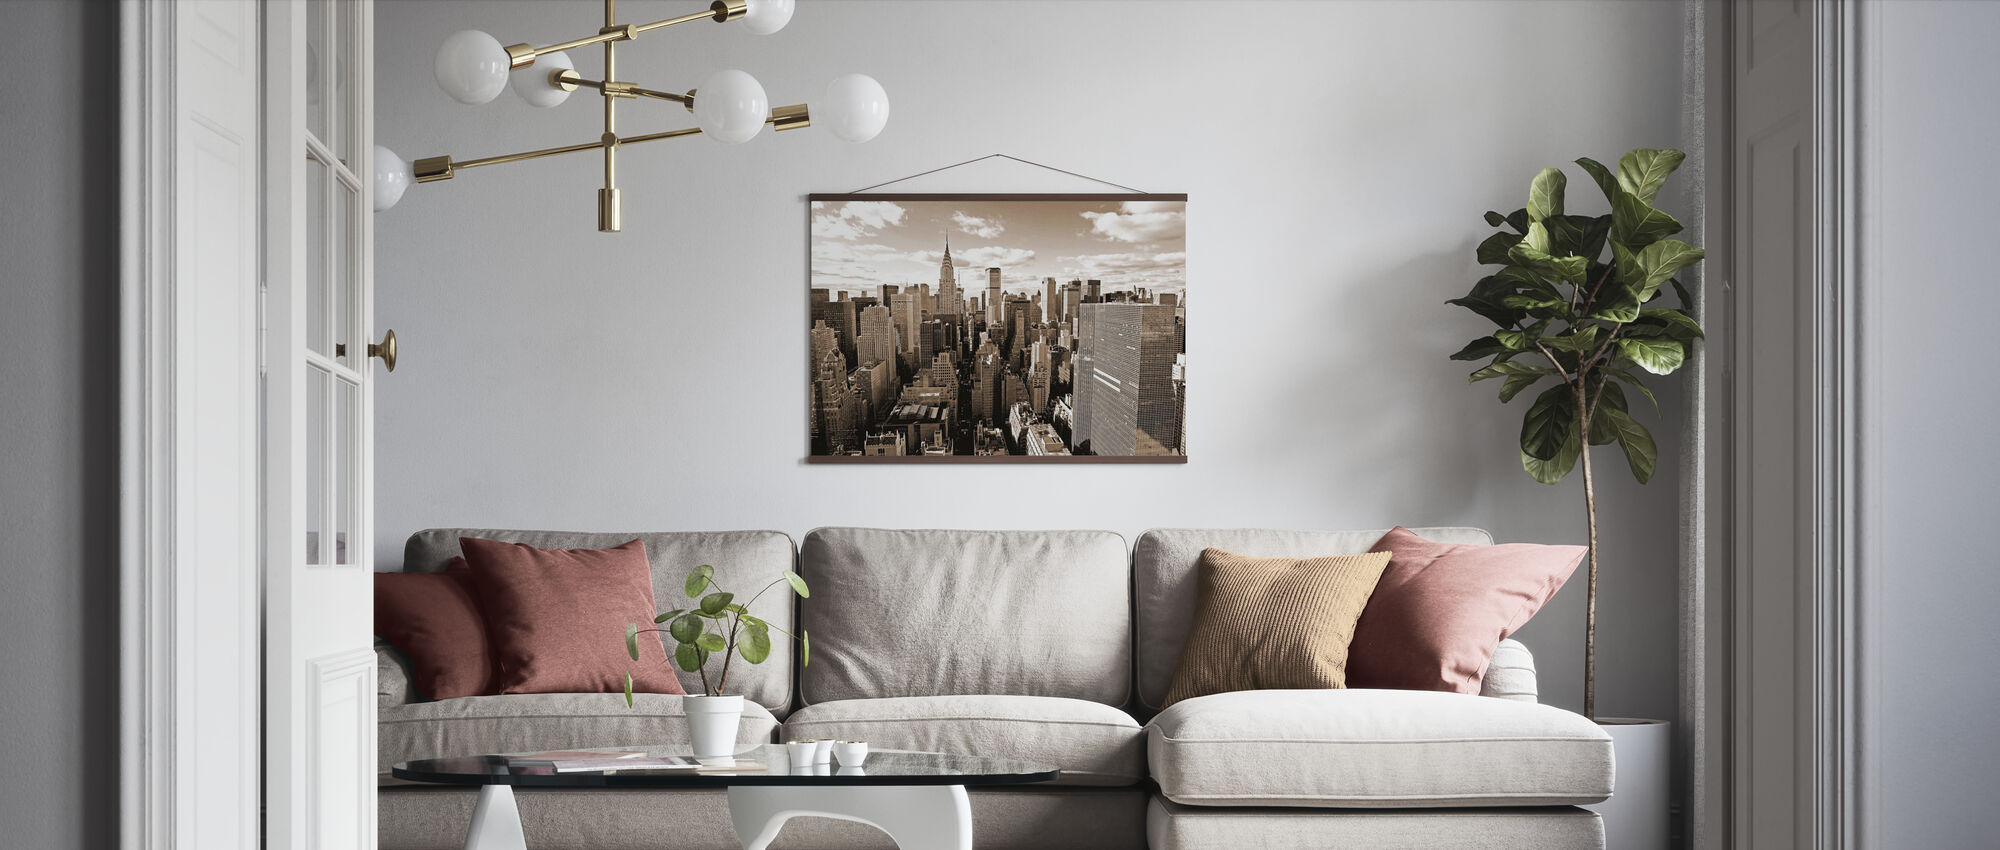 Over Manhattan - Plakat - Stue